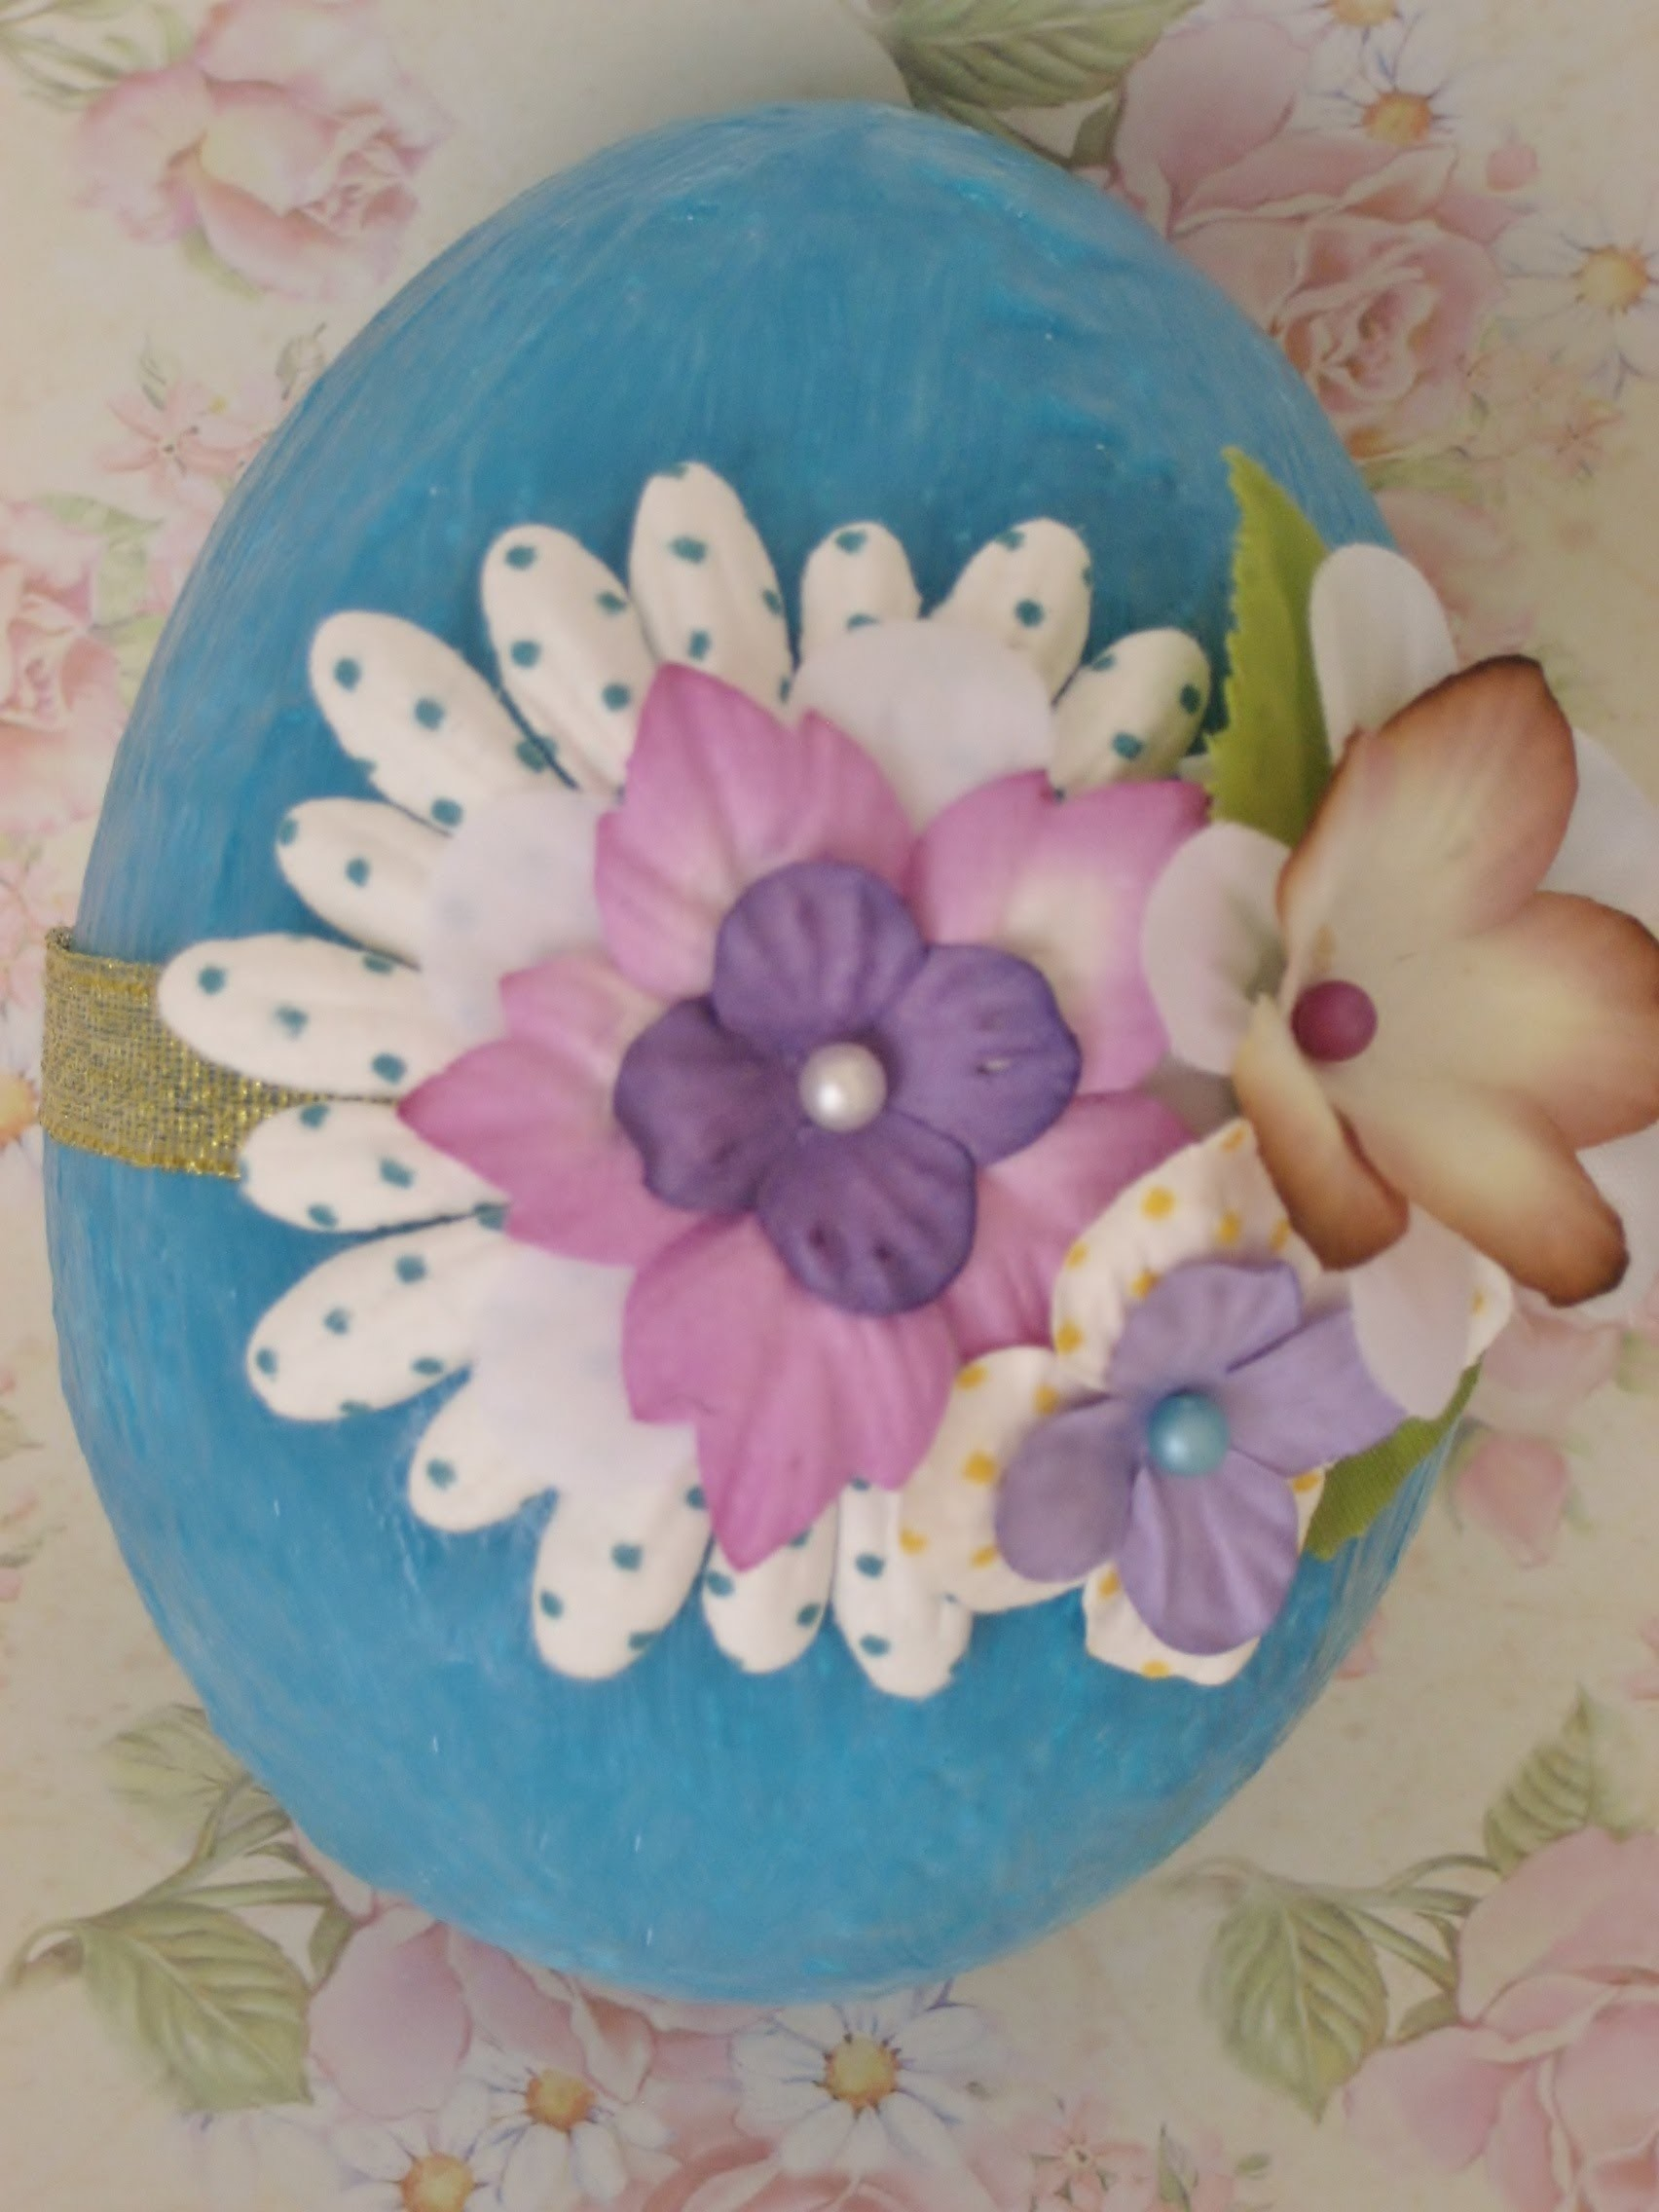 DIY Huevo de Pascua de poliespan. Styrofoam Easter egg